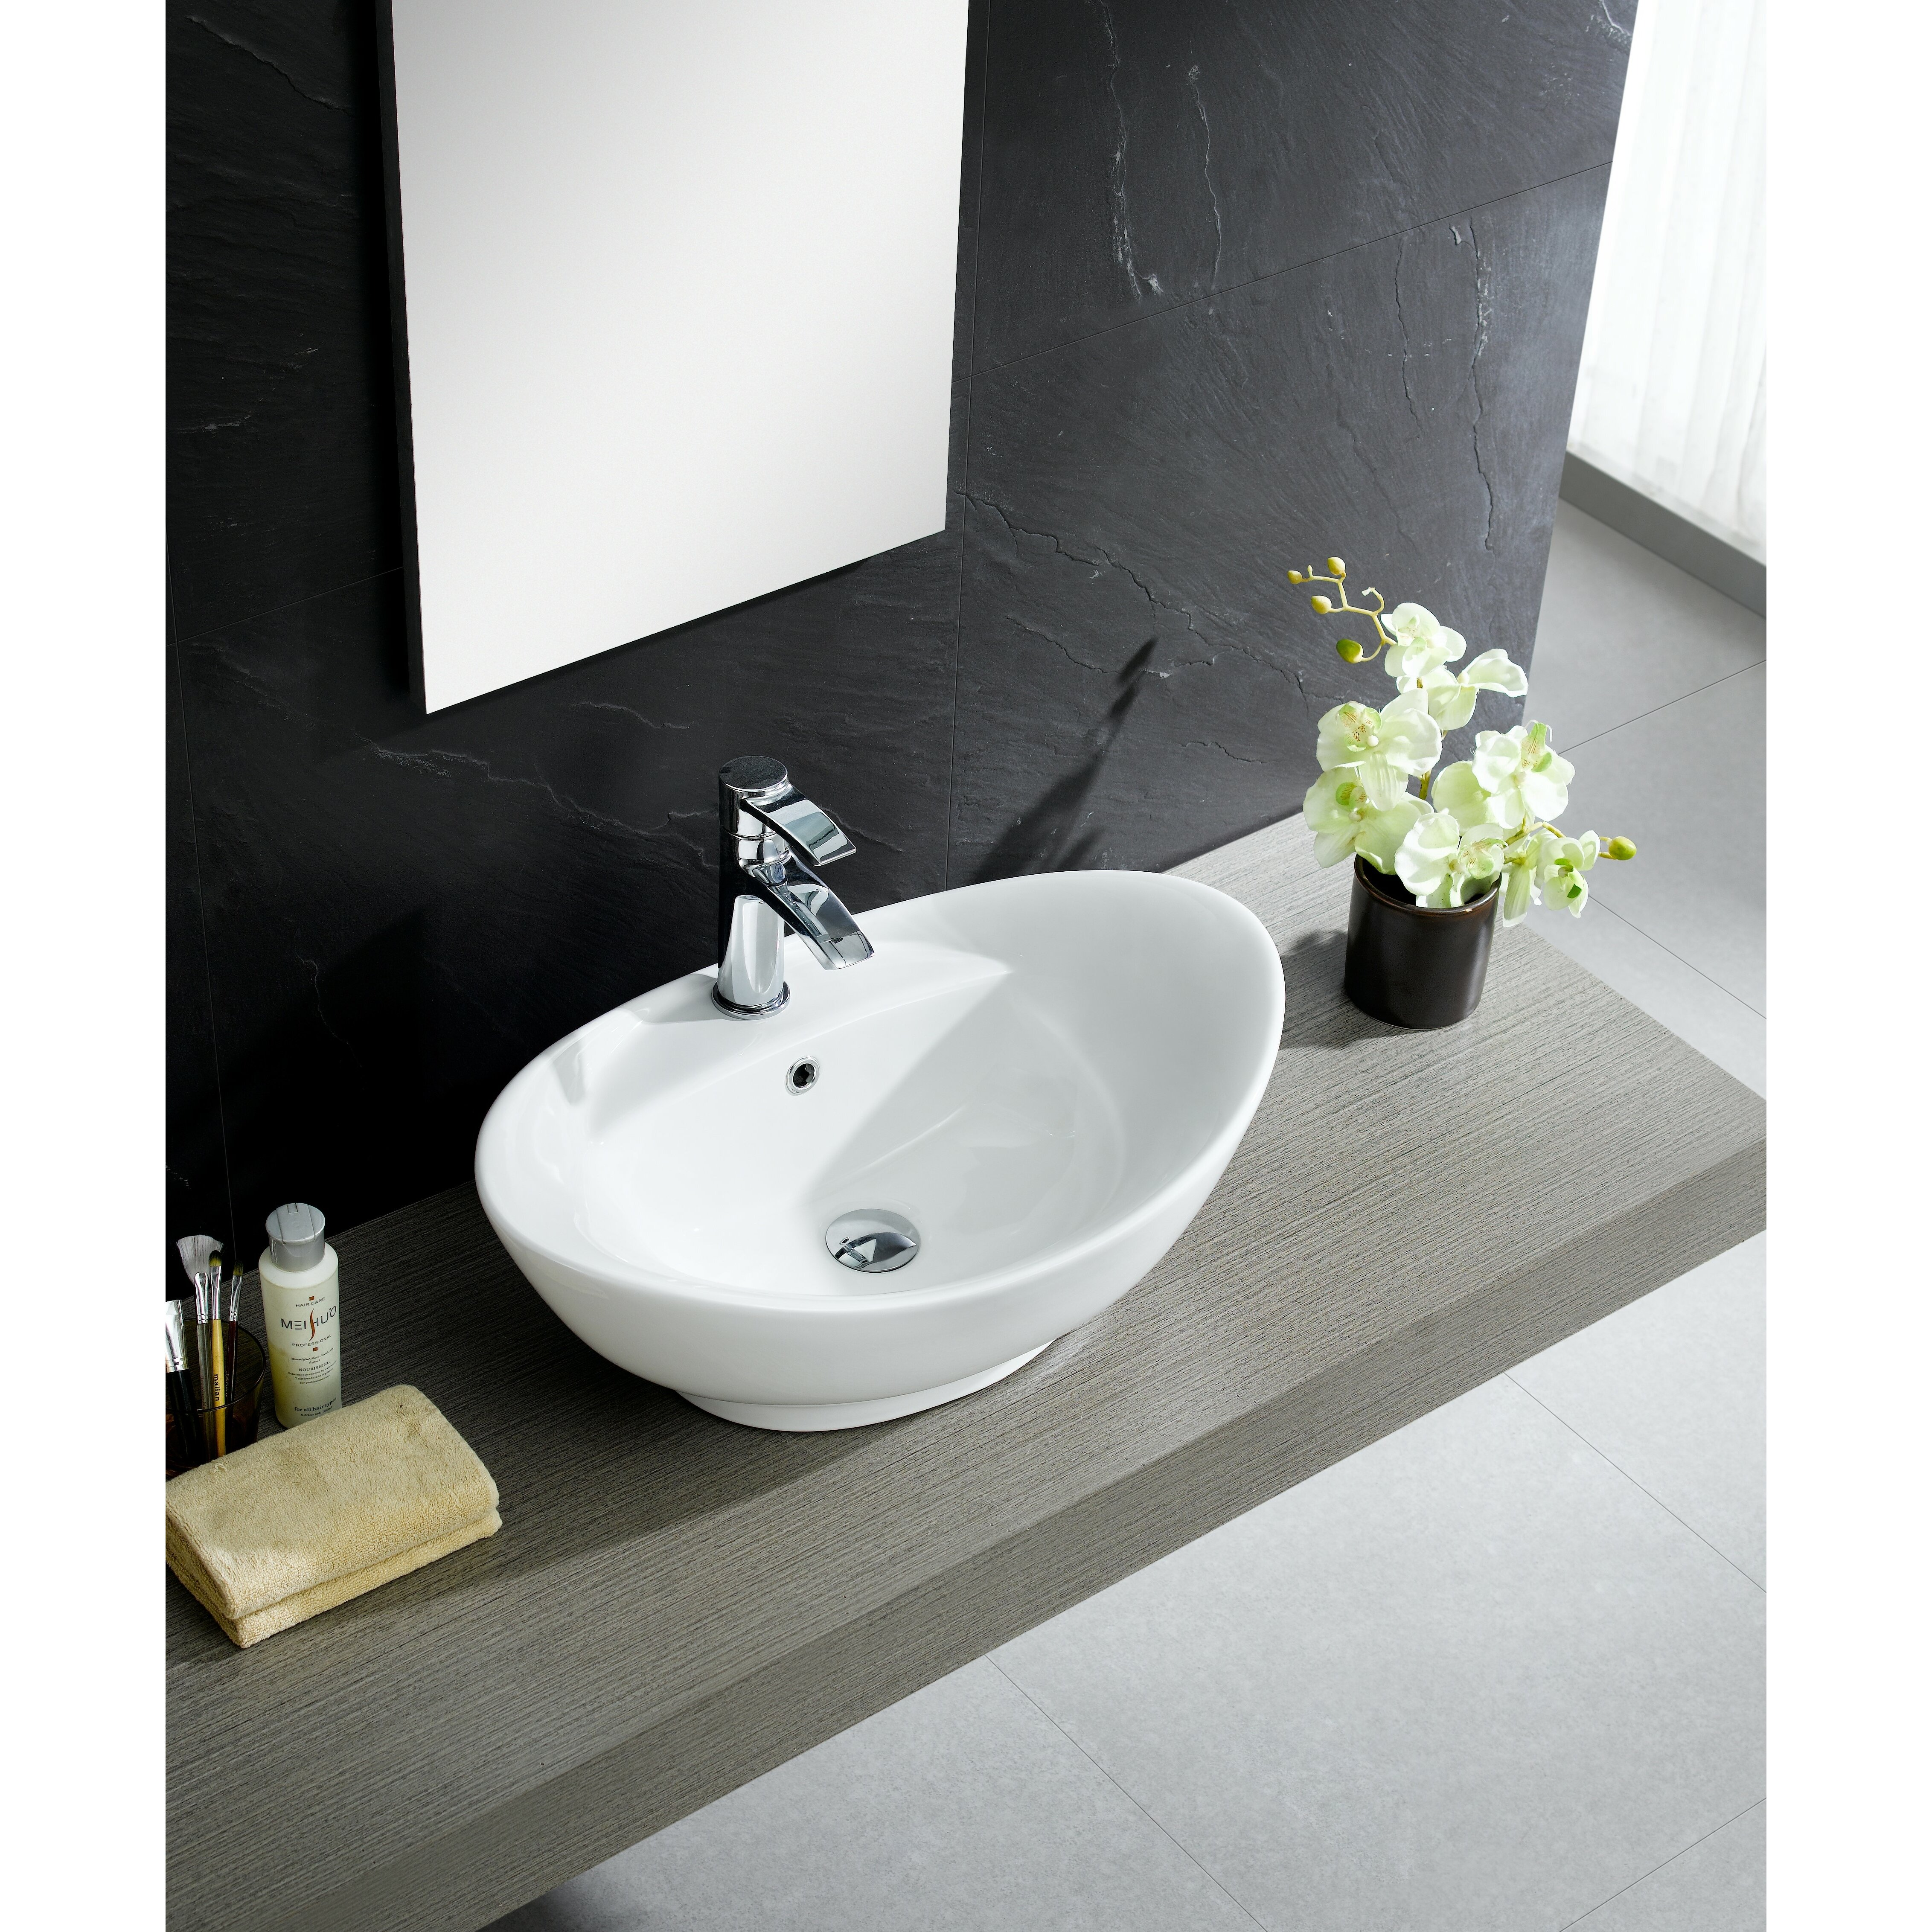 Fixtures Modern Vitreous Large Oval Vessel Sink Vessel Bathroom Sink ...